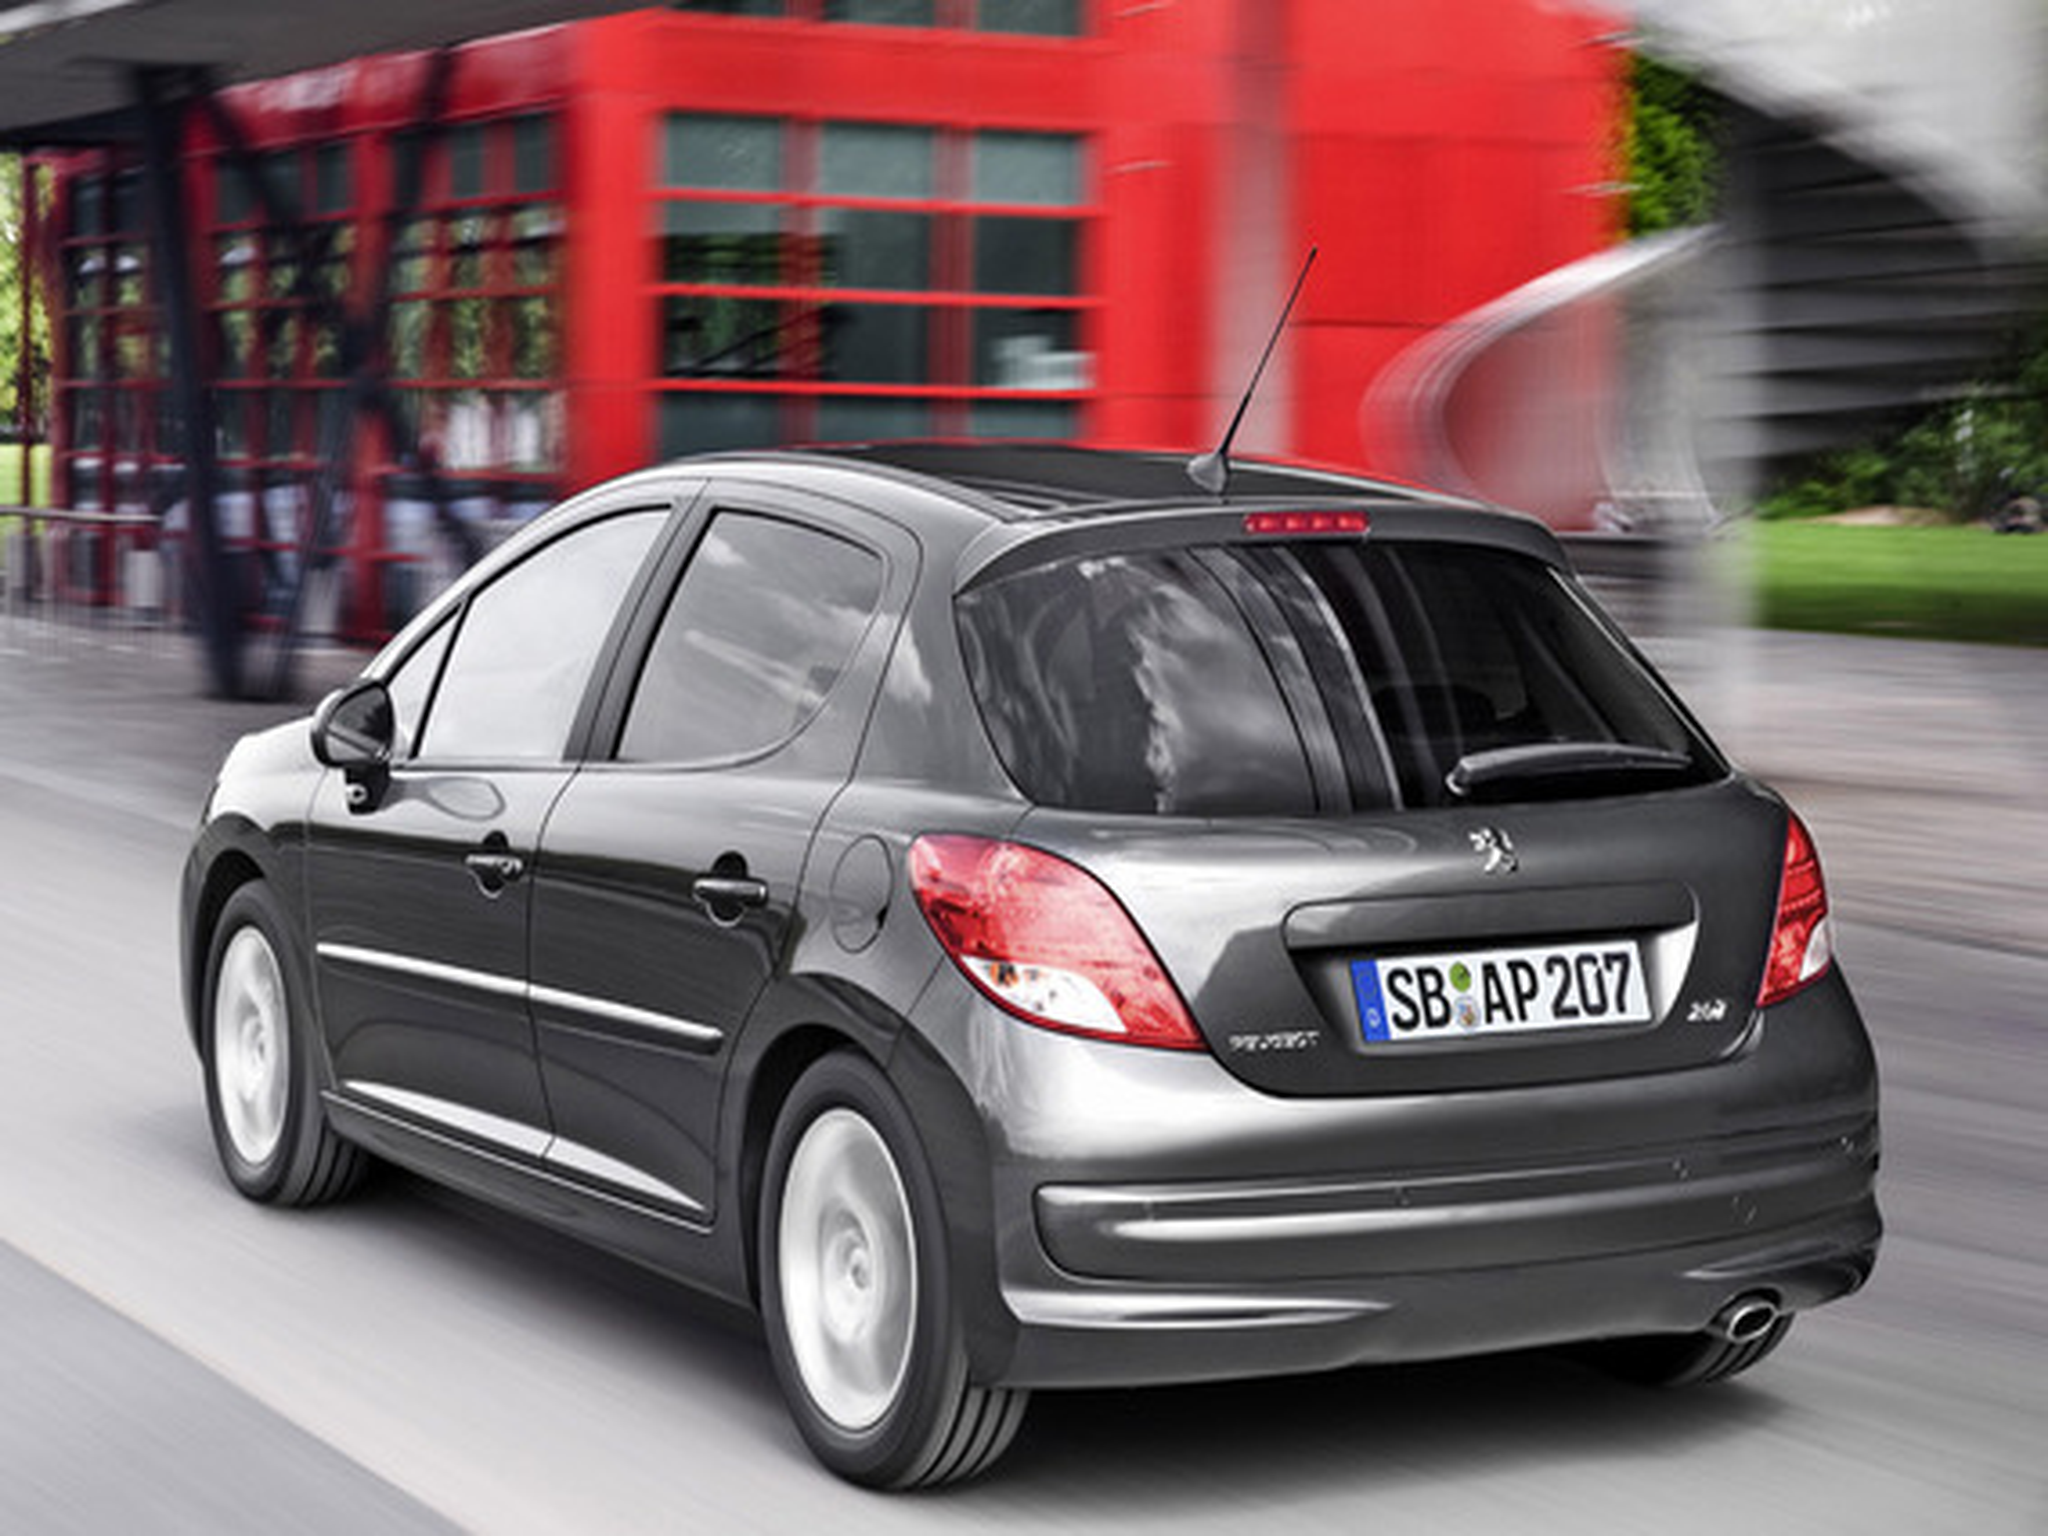 Peugeot 207 с двигателем 1.4 литра плохо разгоняется